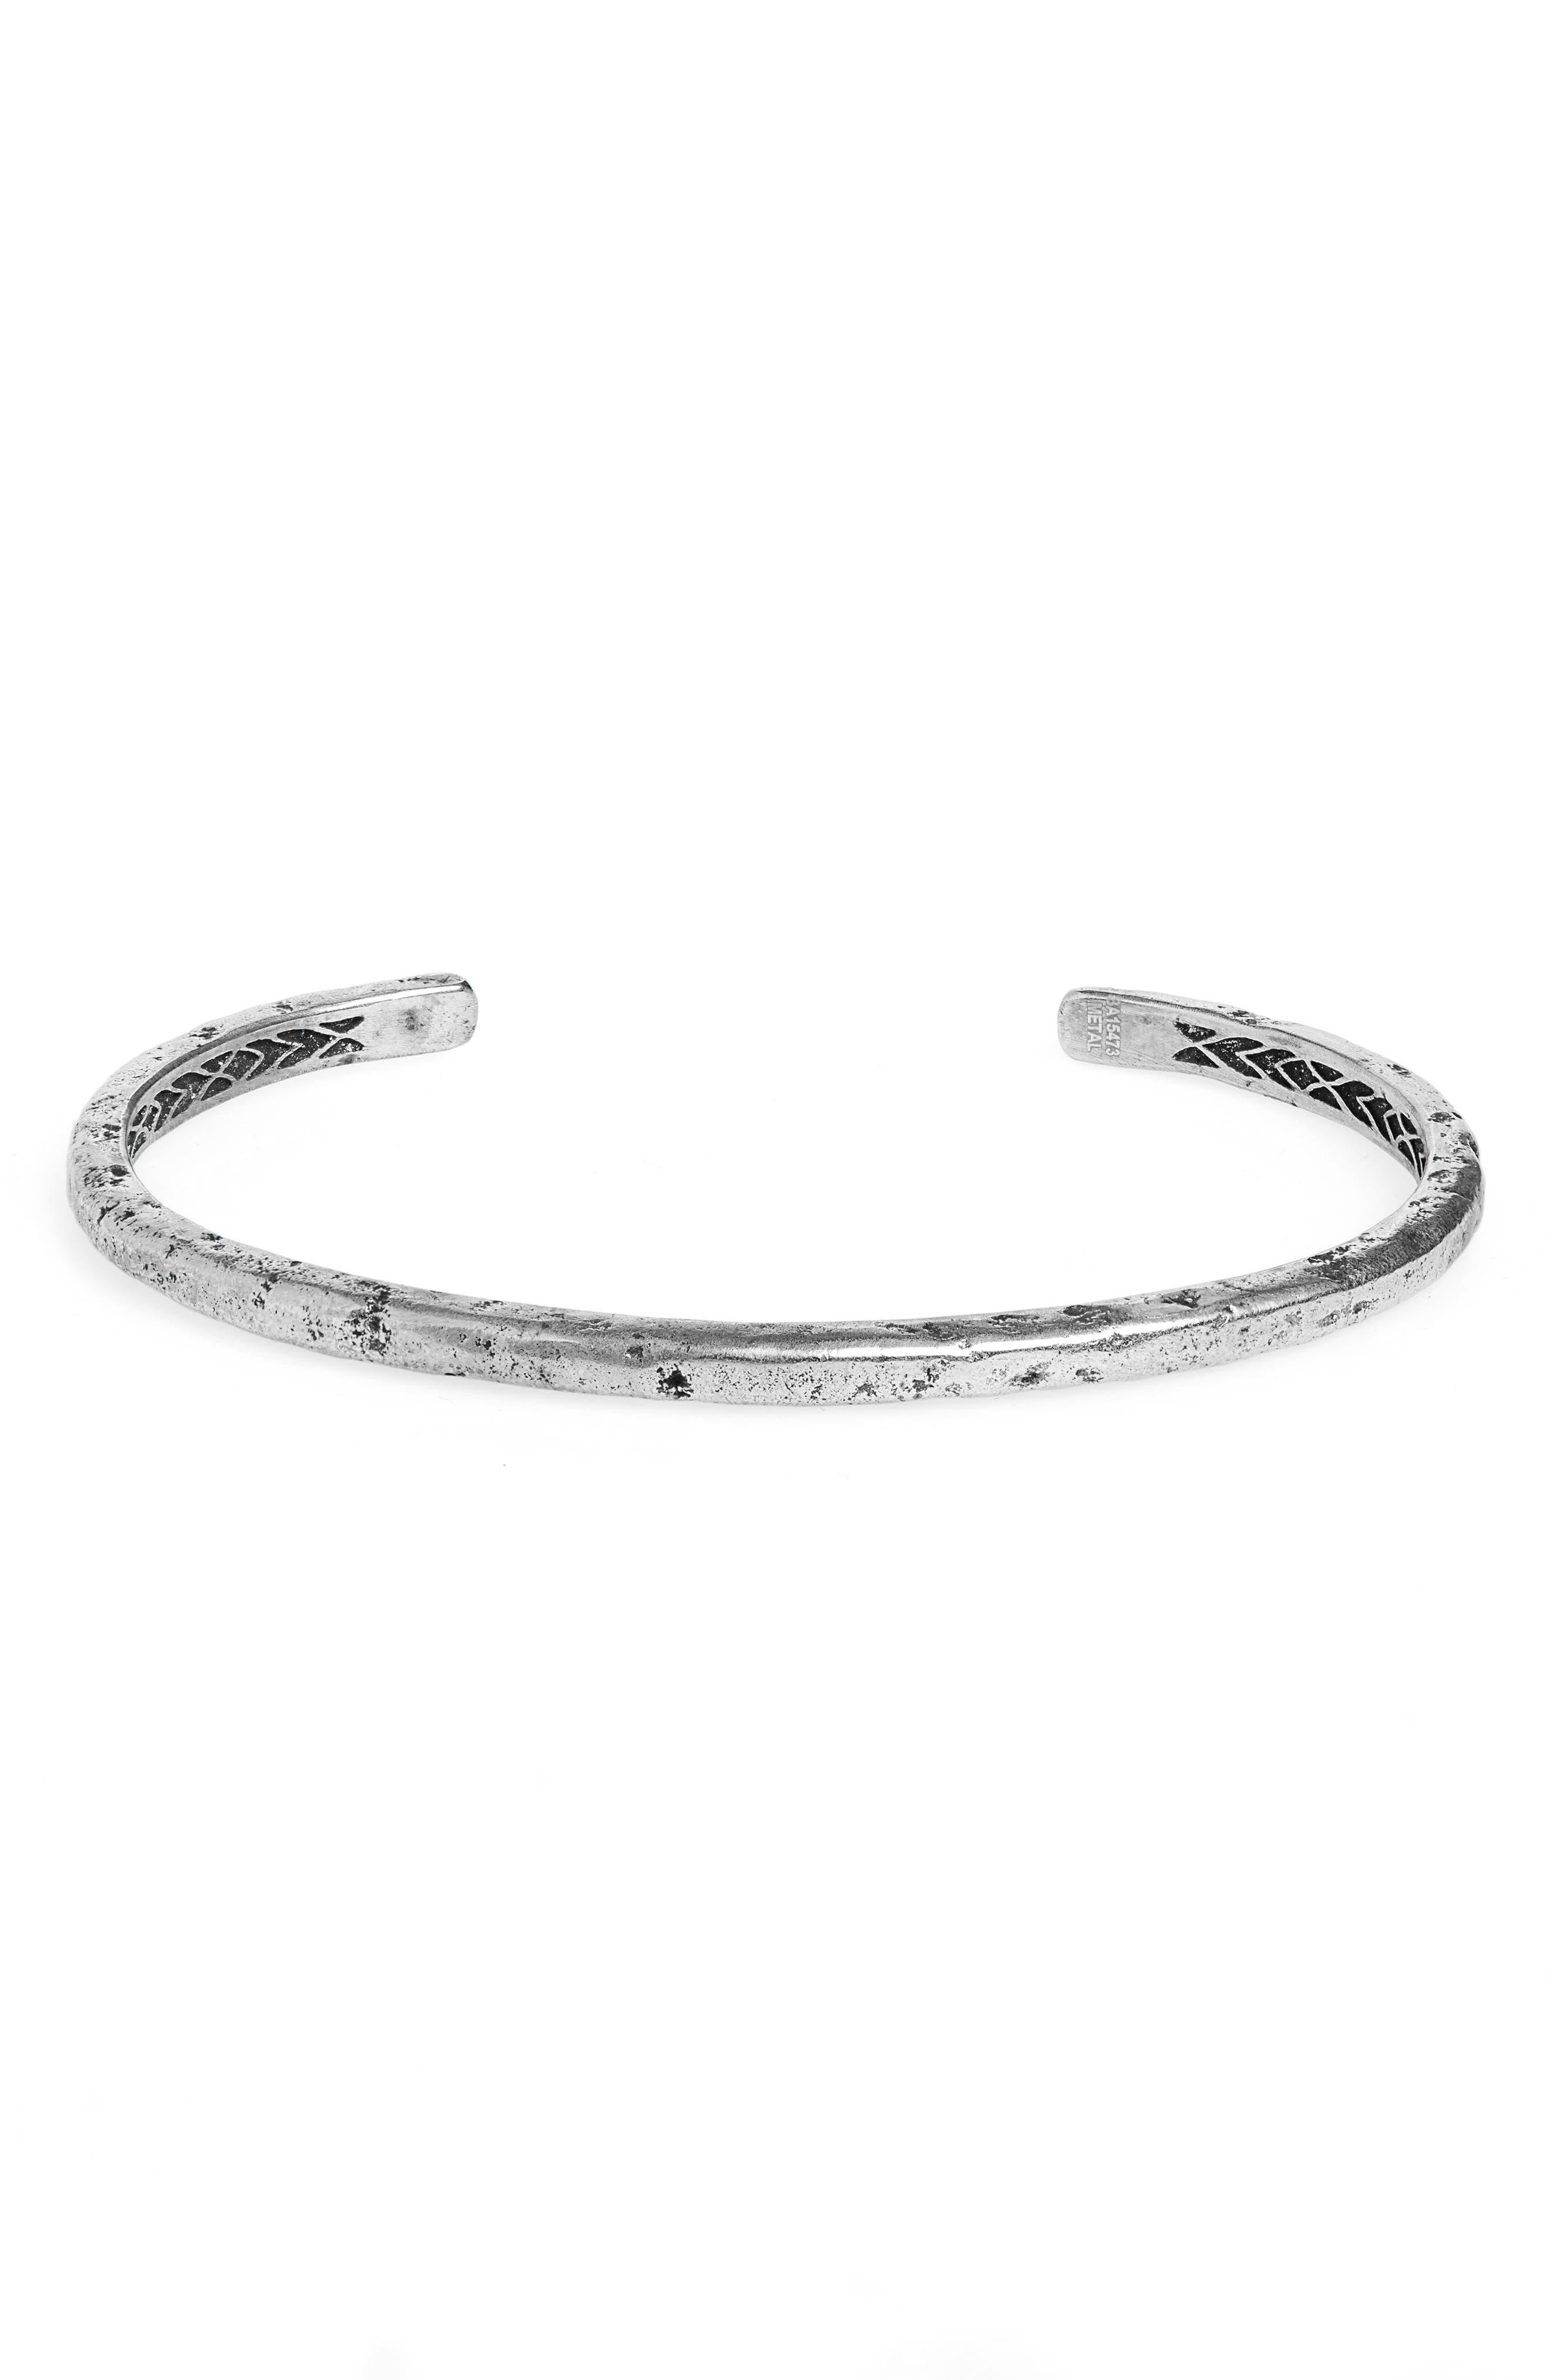 Distressed Silver Cuff Bracelet